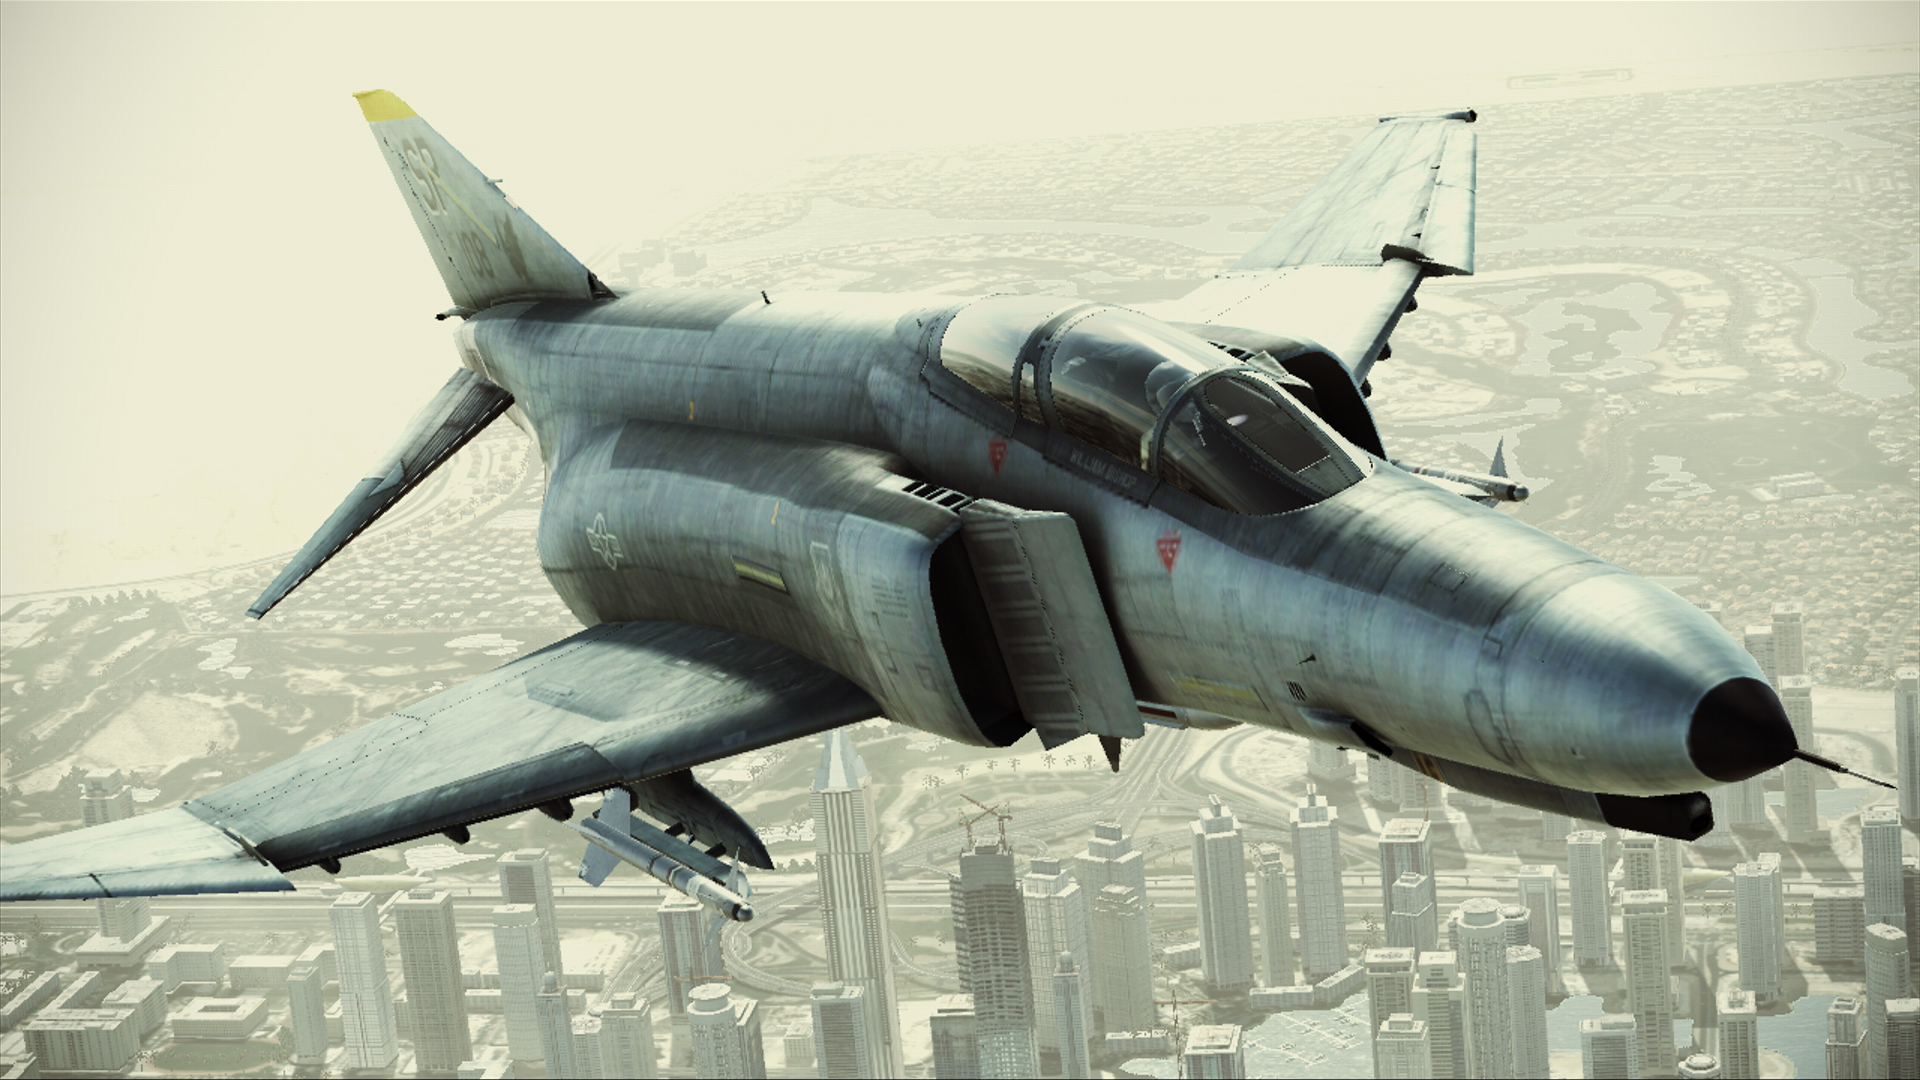 Awesome Car Wallpaper Angles Ace Combat Assualt Horizon Pre Order Information Bifuteki